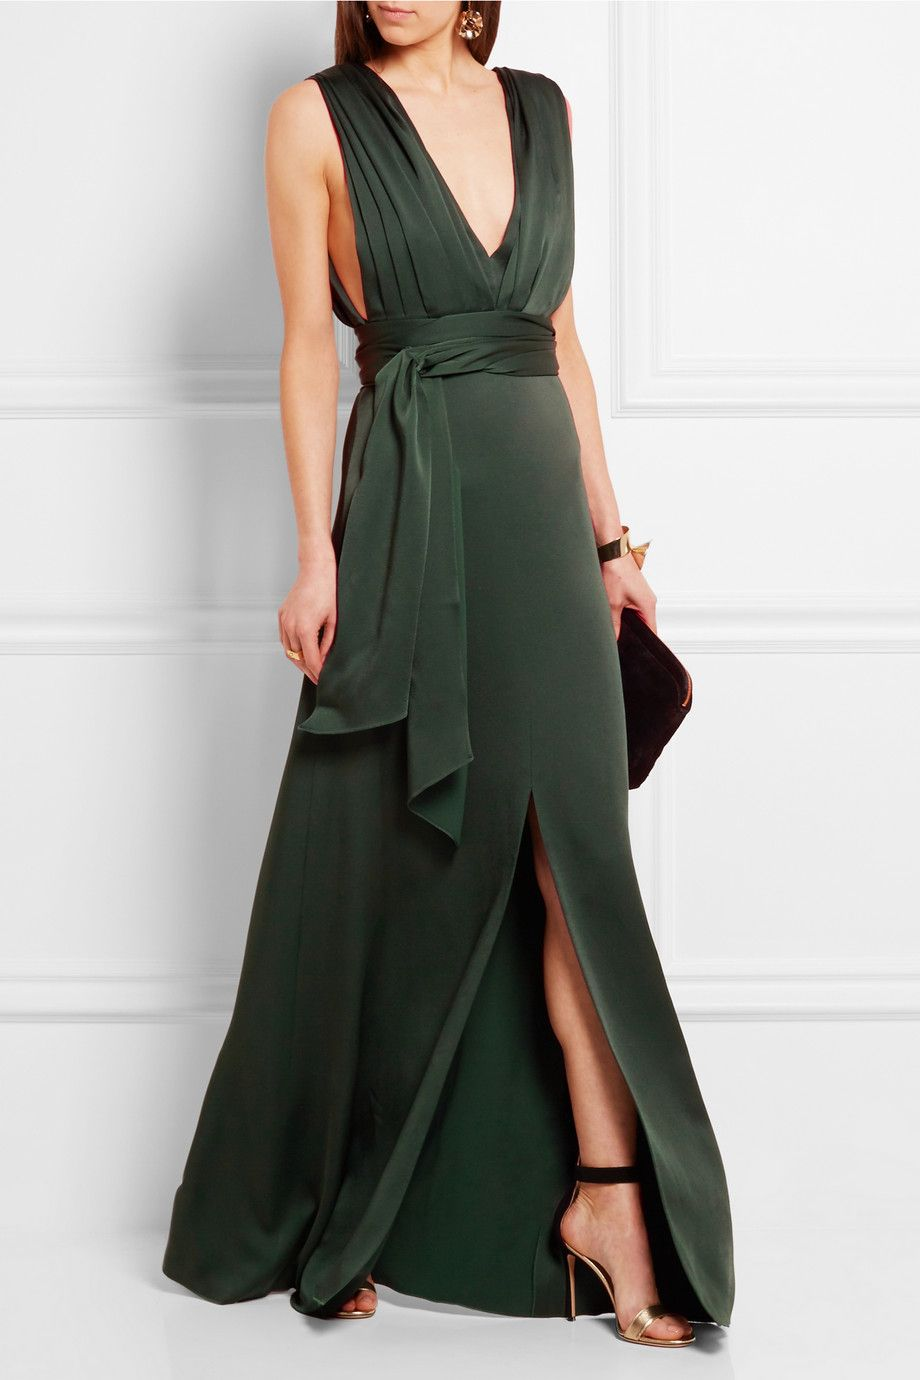 Victoria beckham draped satin gown netaportercom style